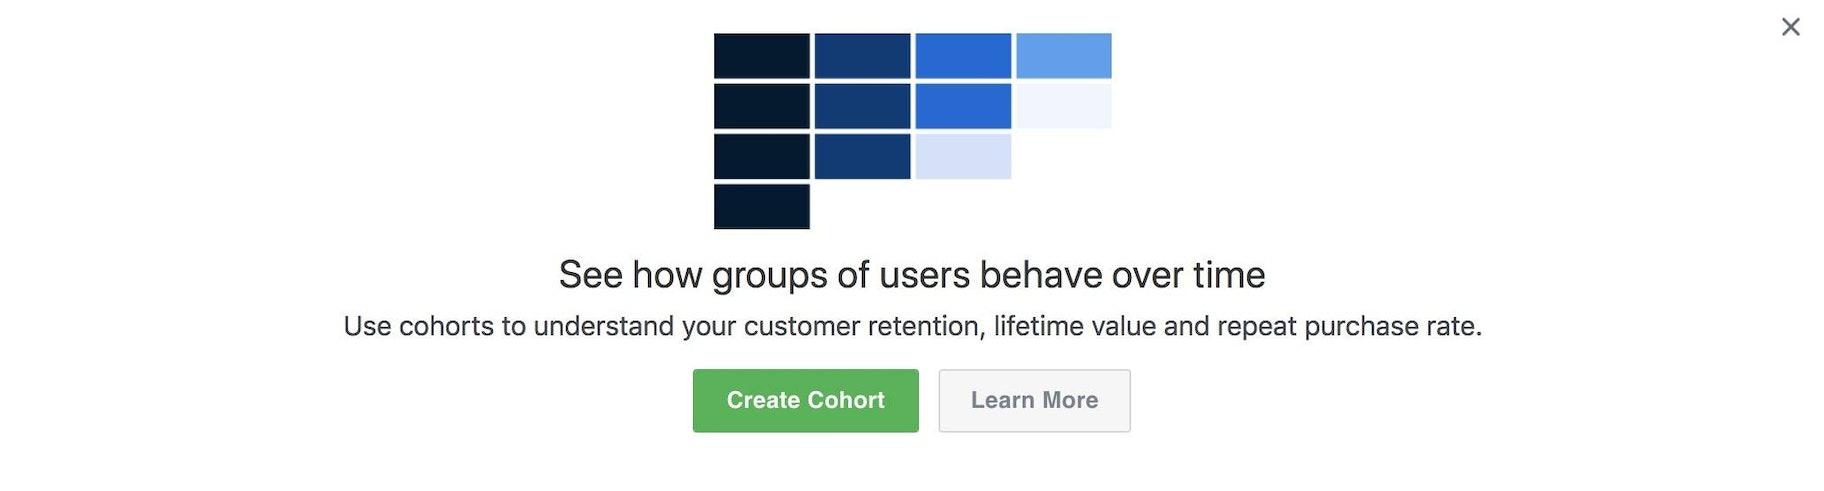 Creating cohorts in Facebook analytics